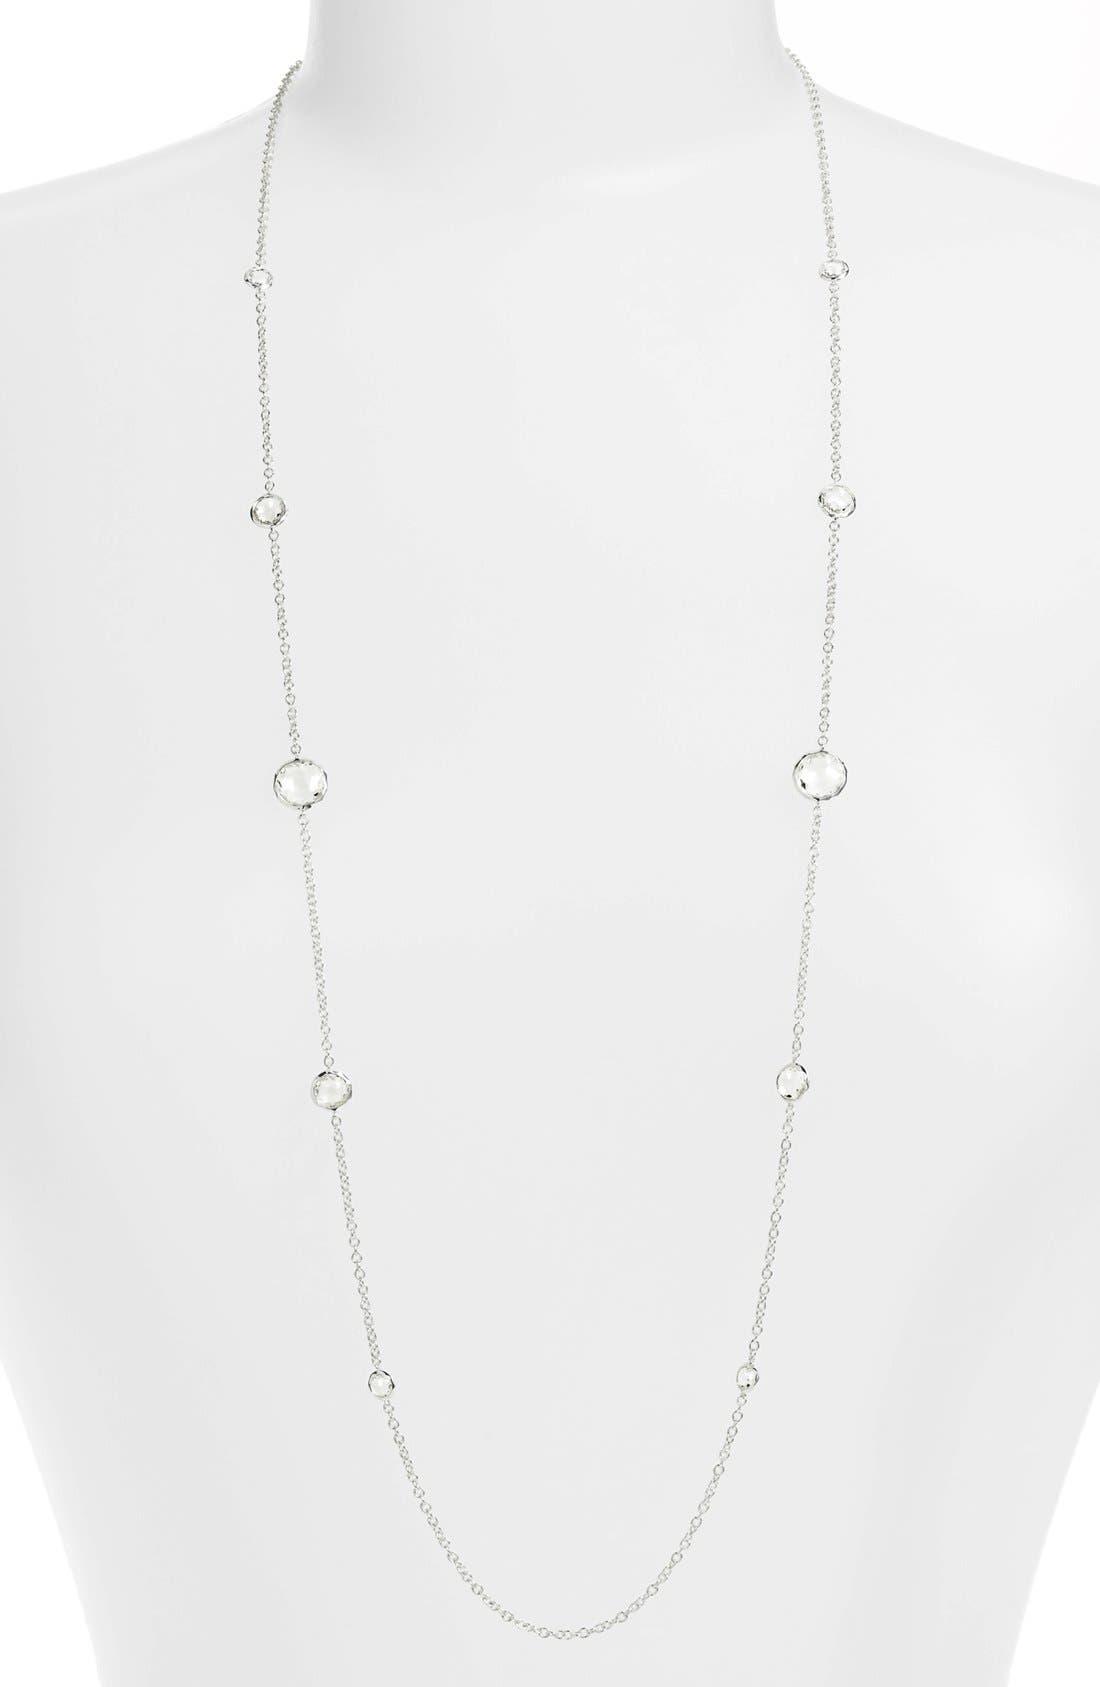 Alternate Image 1 Selected - Ippolita 'Rock Candy - Lollipop' Long Necklace (Online Only)